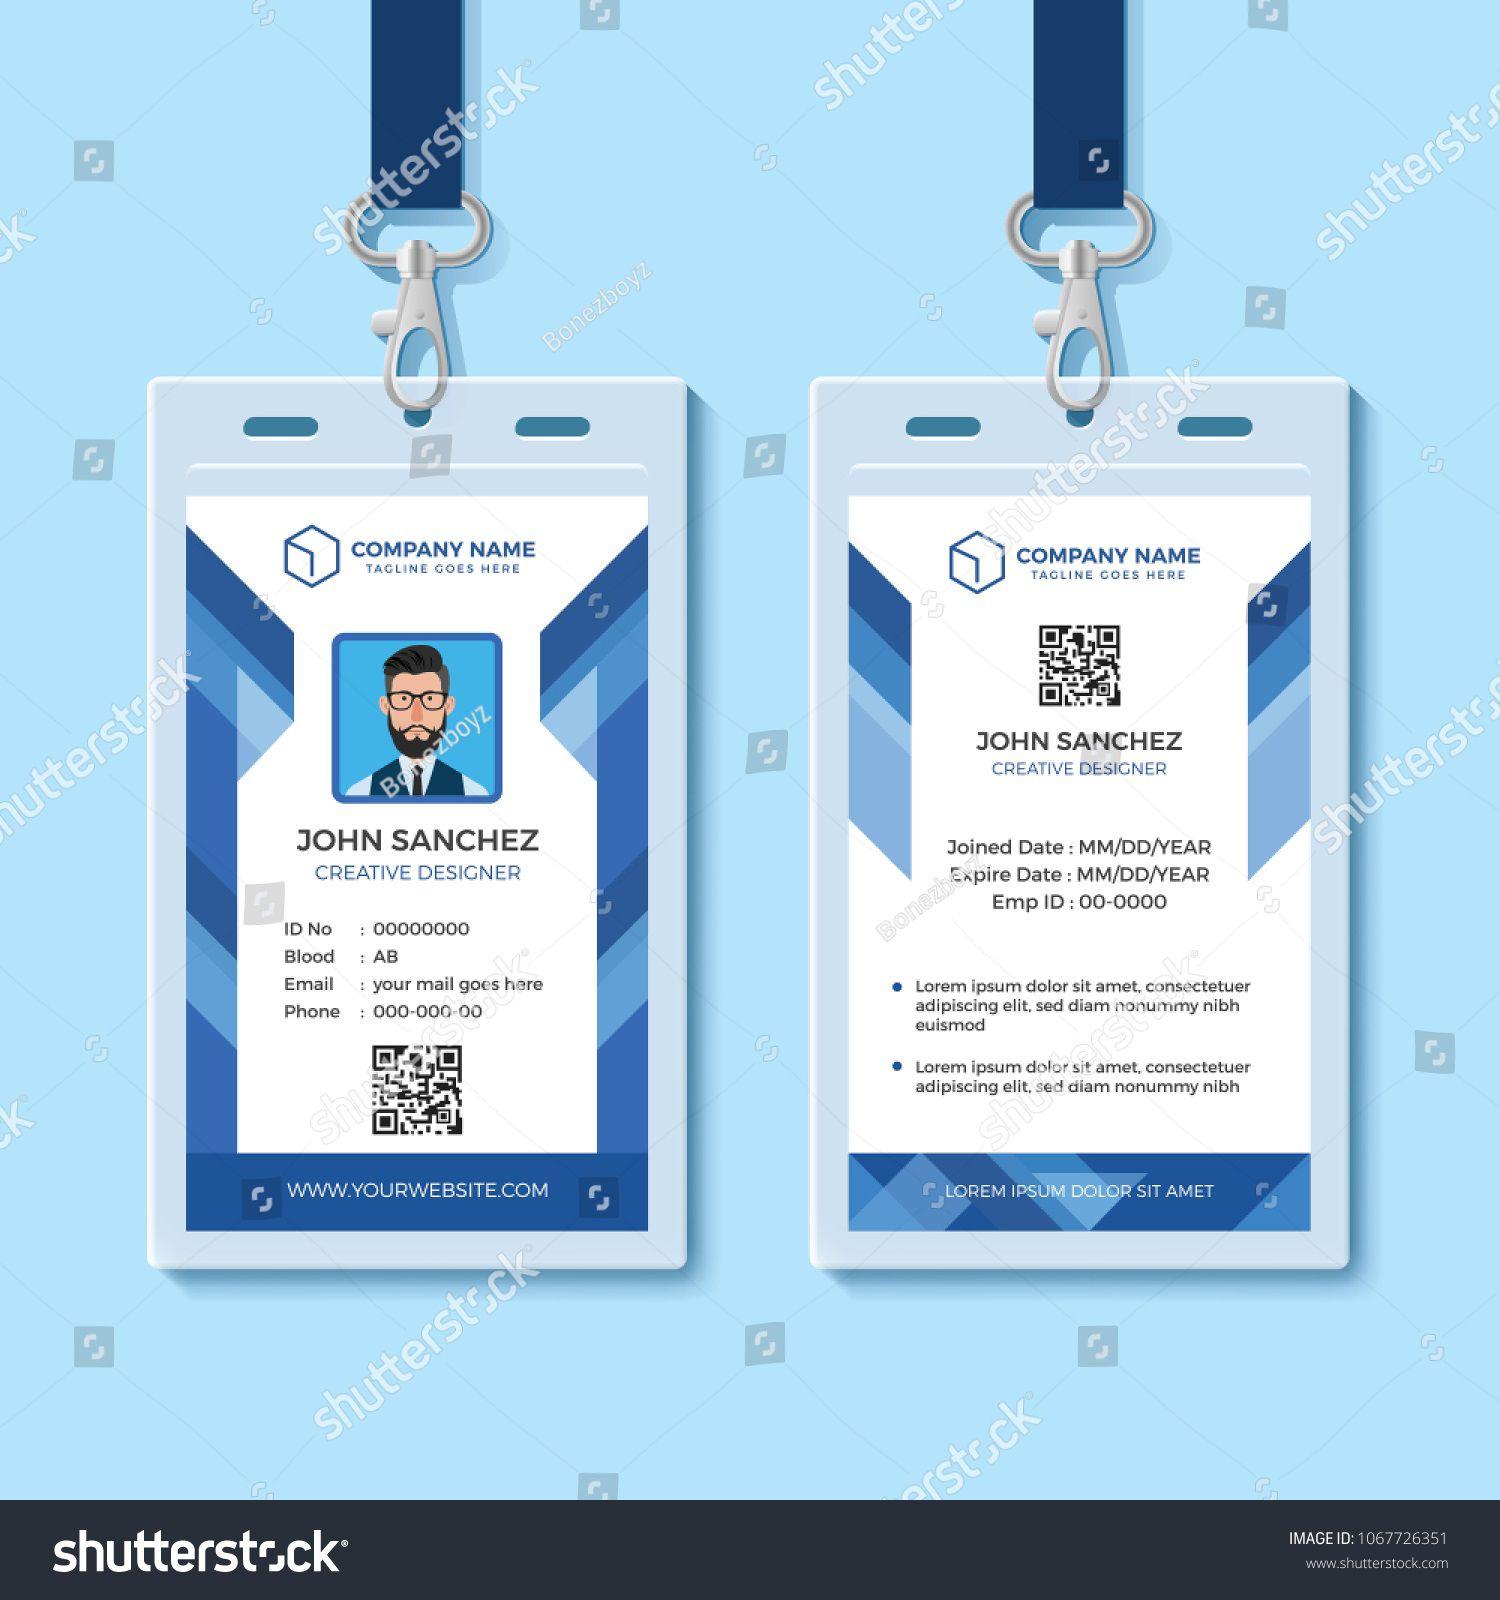 Employee Id Card Template